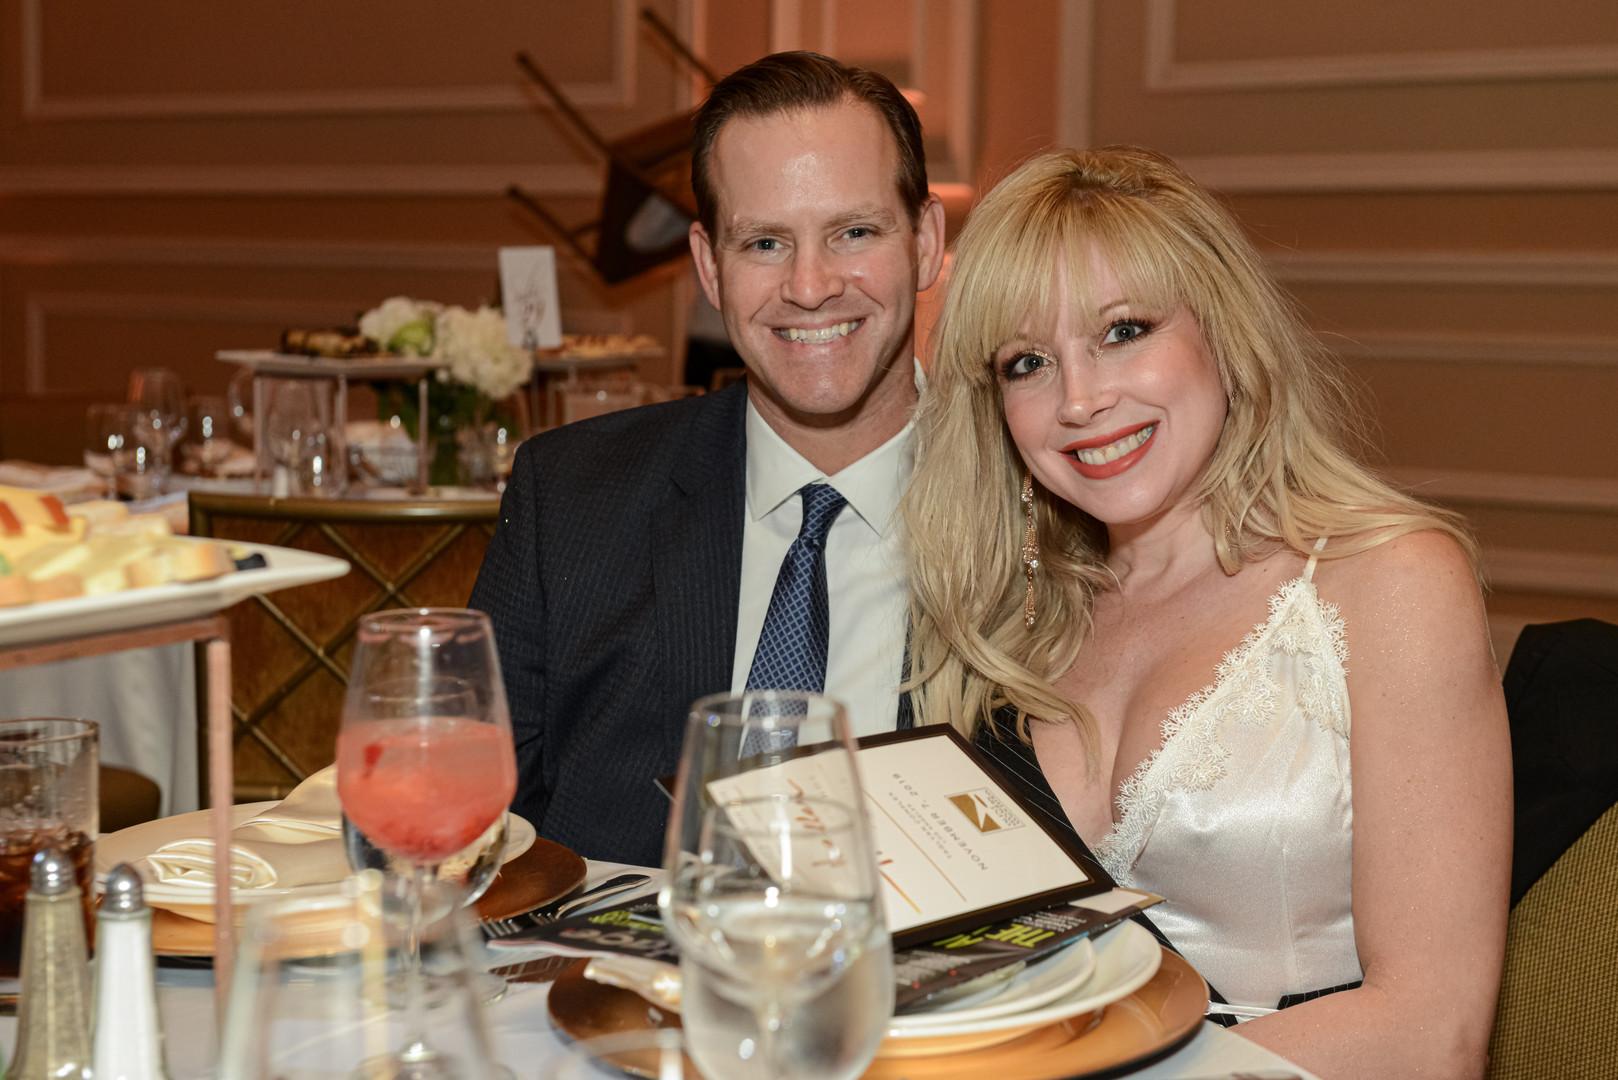 The Heller Awards 2019